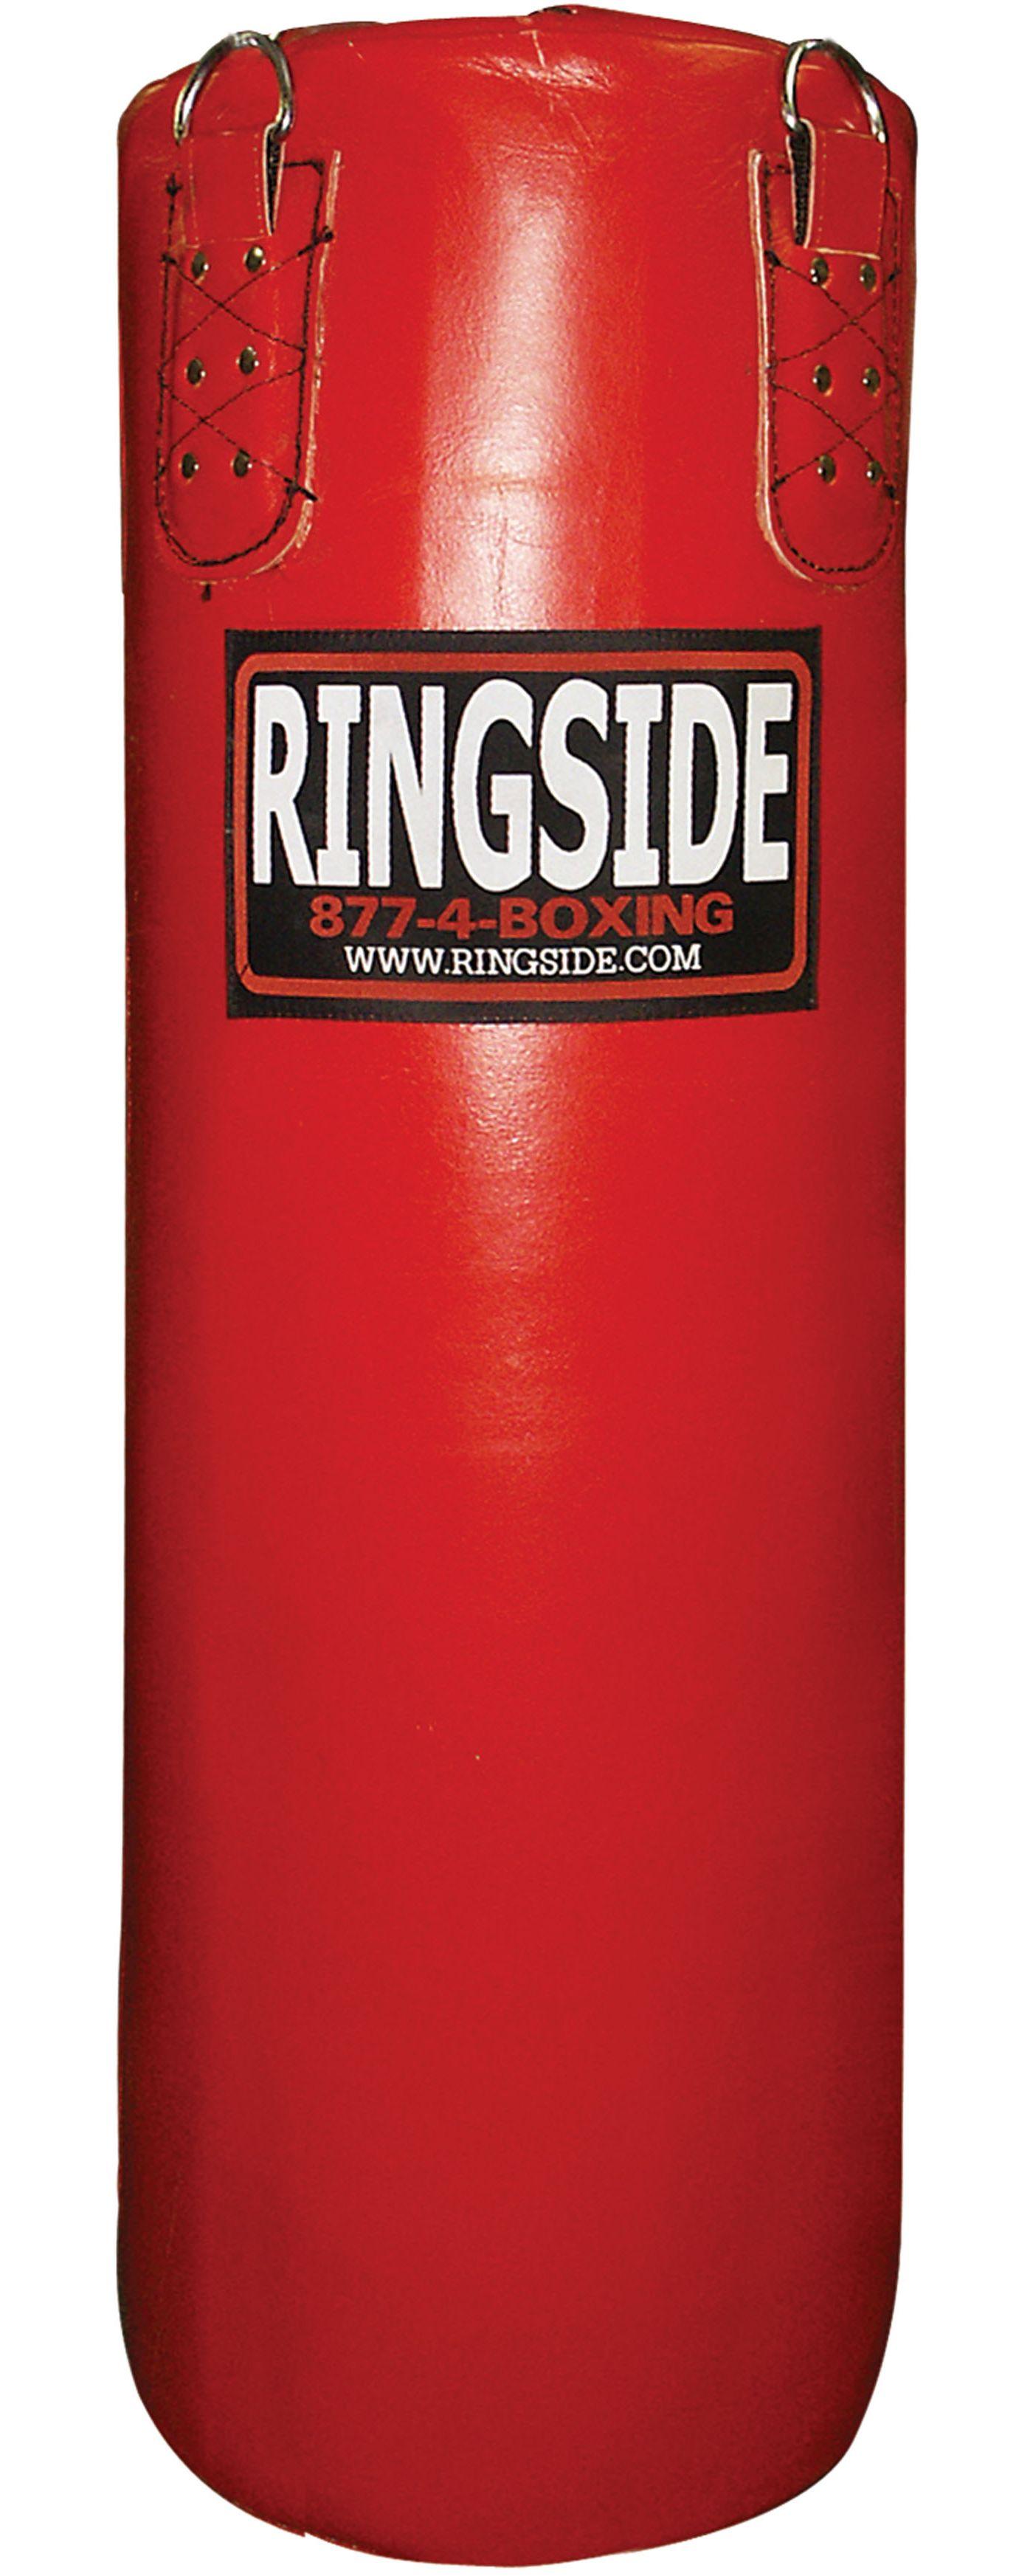 Ringside 70 lb. Leather Heavy Bag